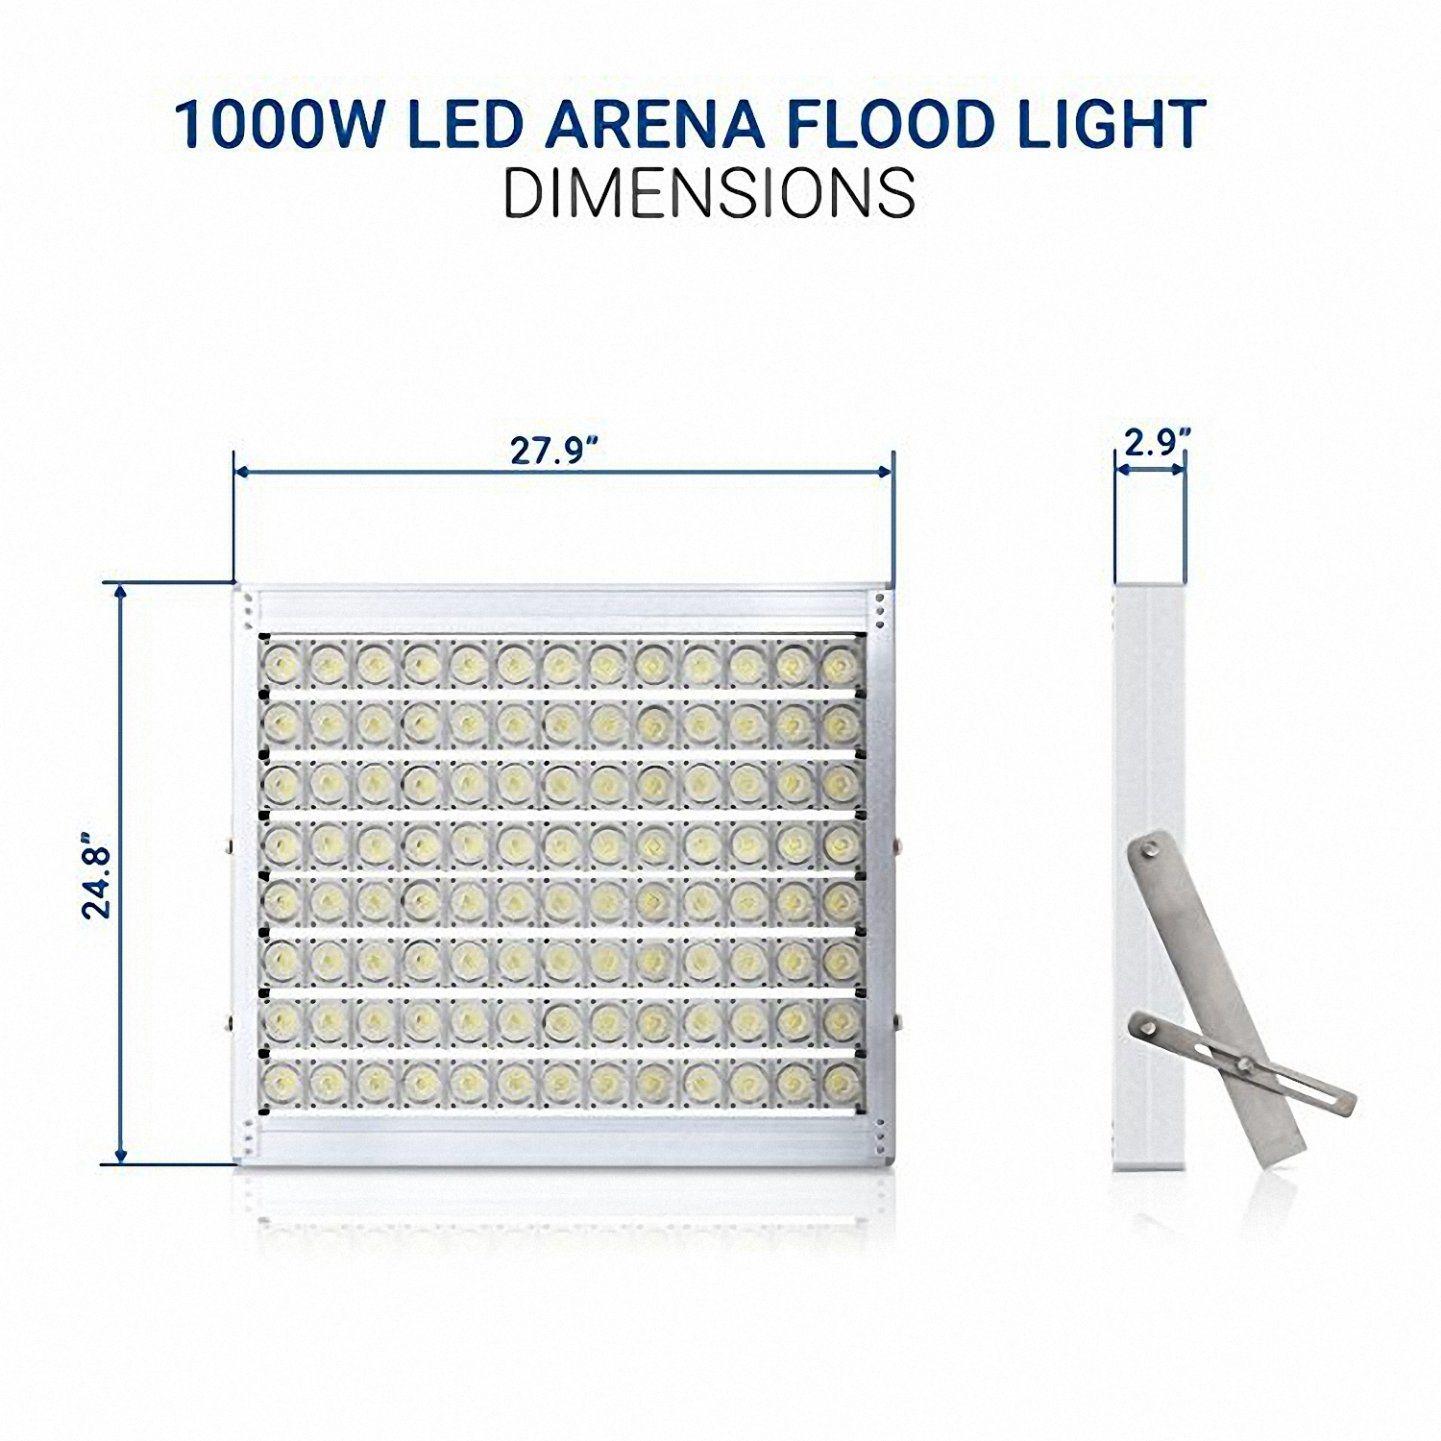 1000 Watt Metal Halide Led Replacement china professional outdoor stadium light high power 1000